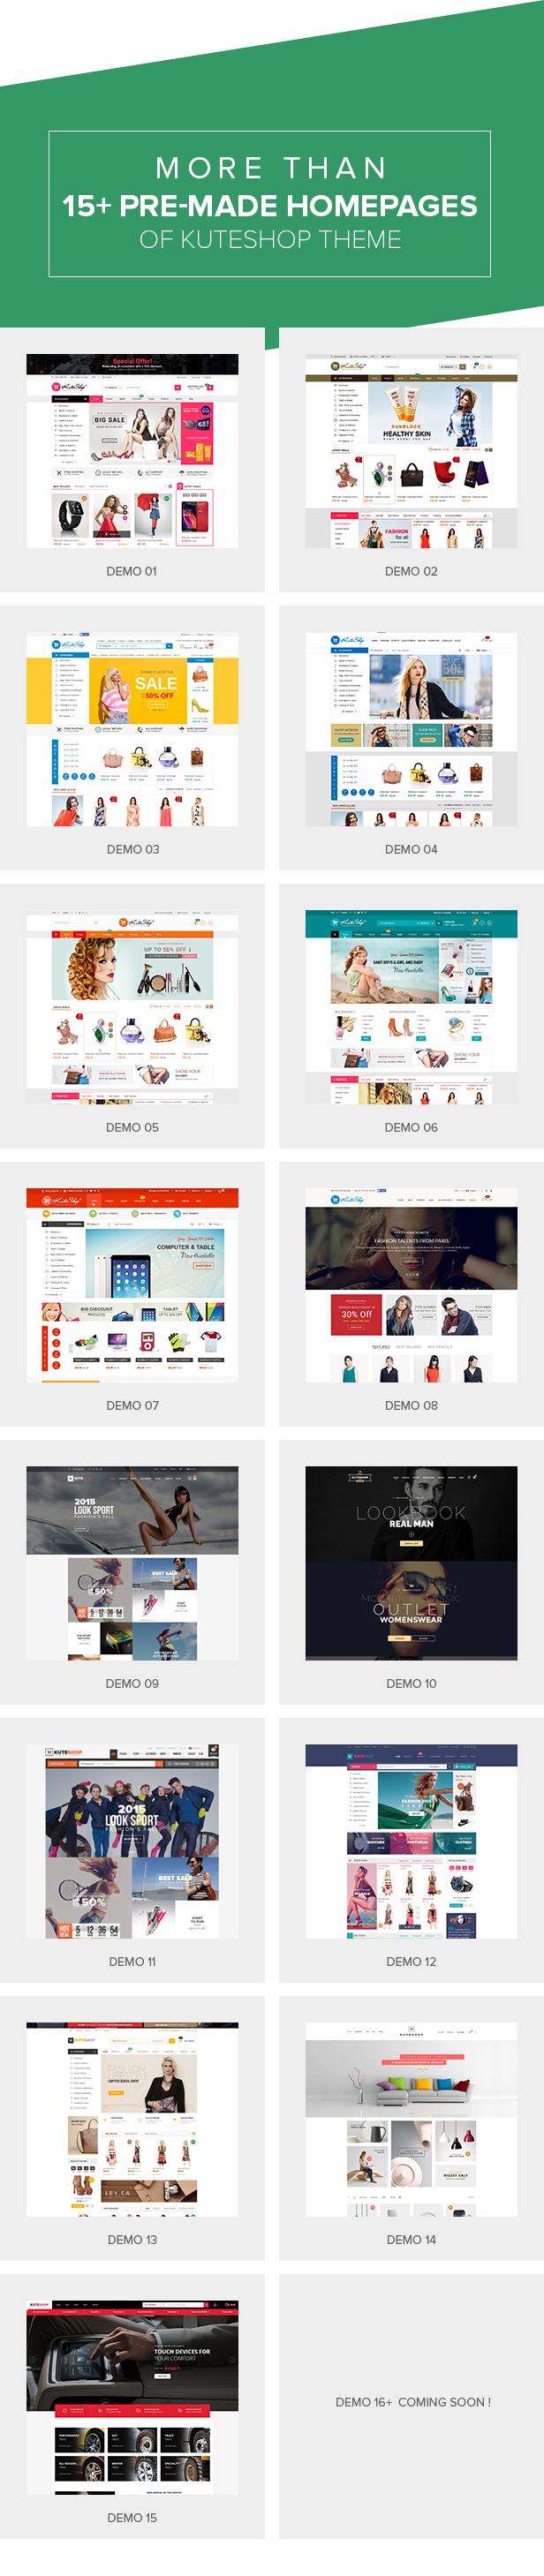 KuteShop - موضوع WooCommerce للموضة والإلكترونيات والسوق (يدعم RTL) - 10